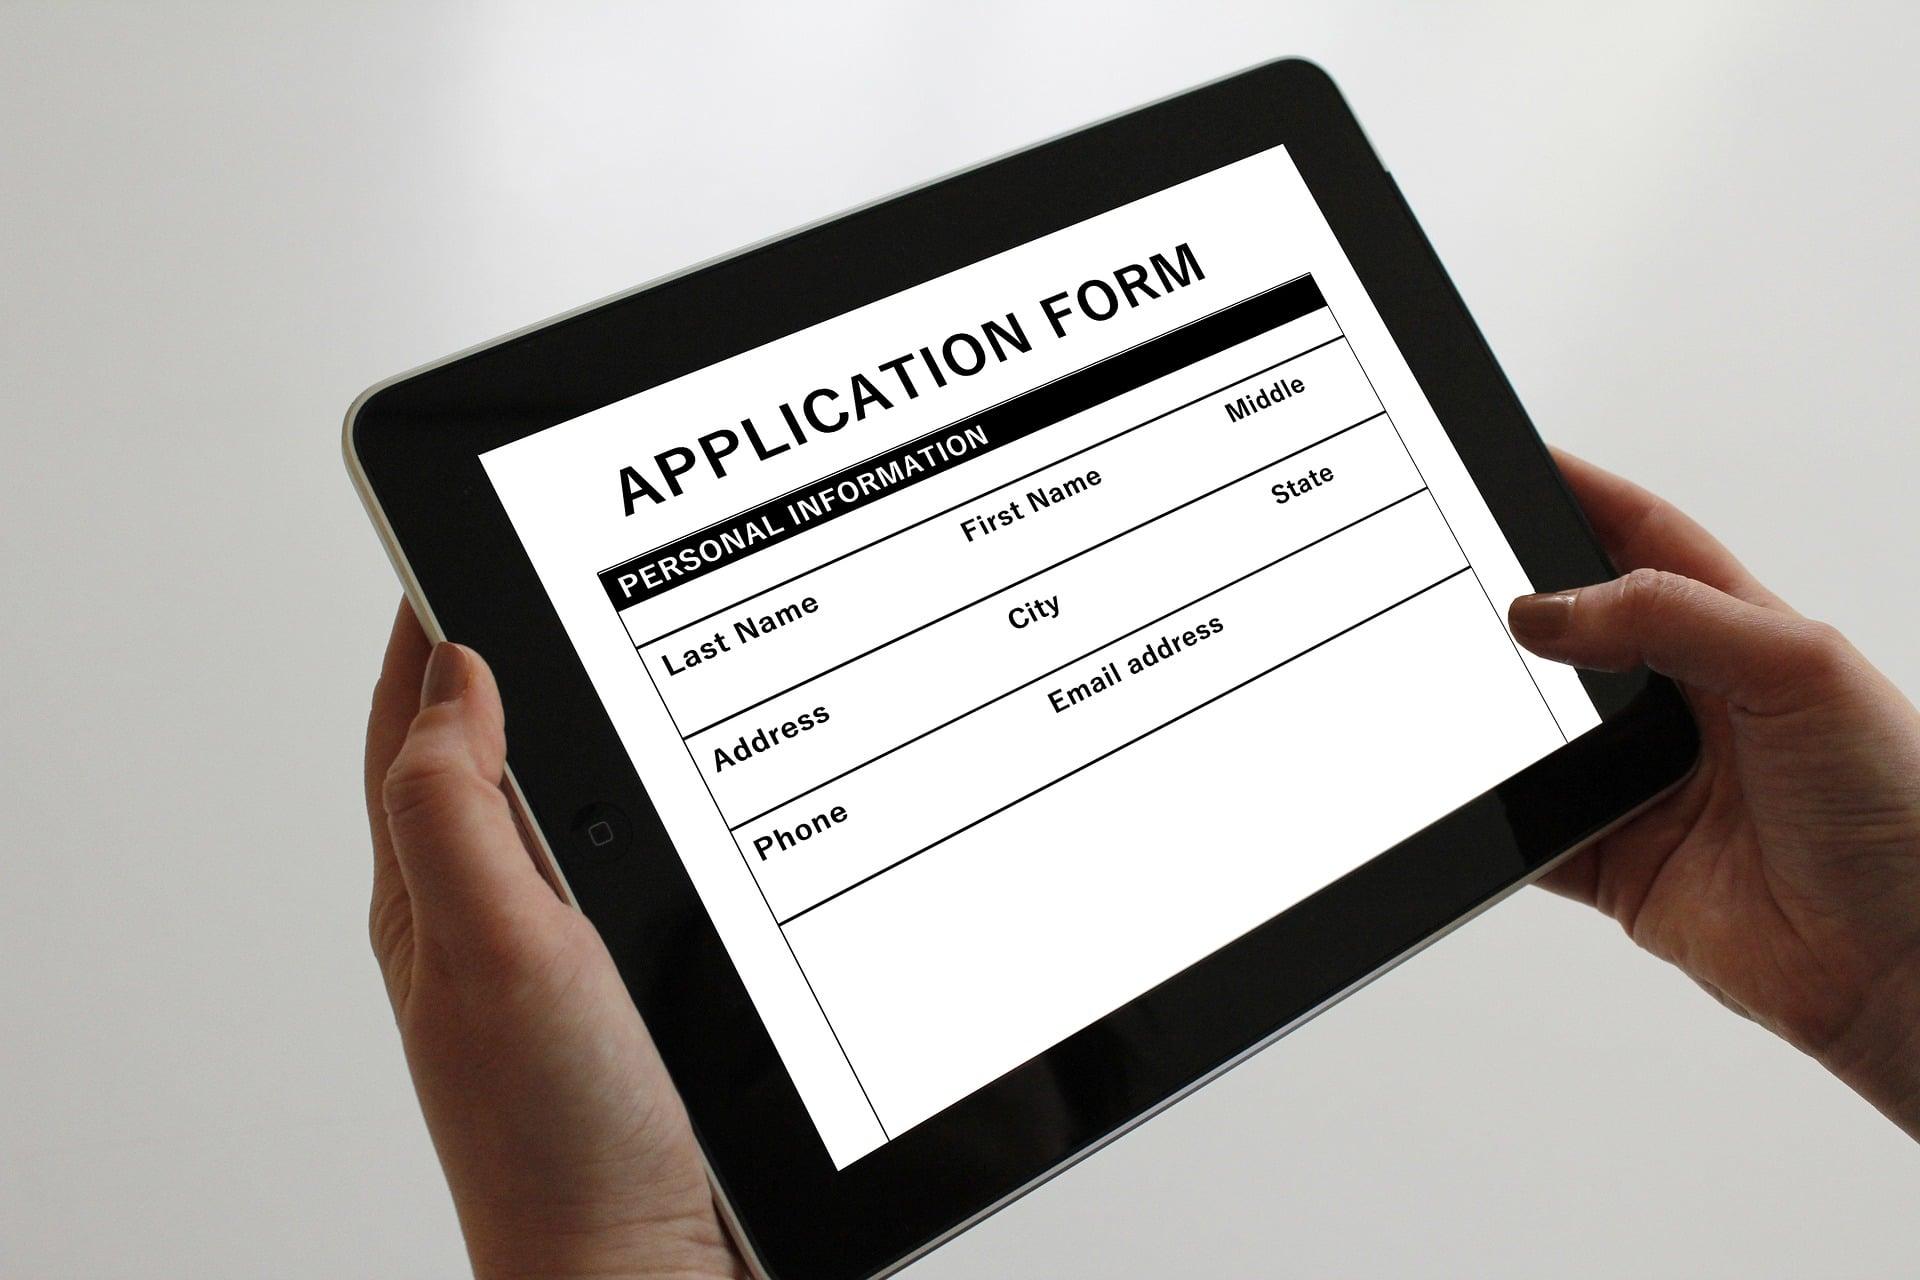 application-1883453_1920